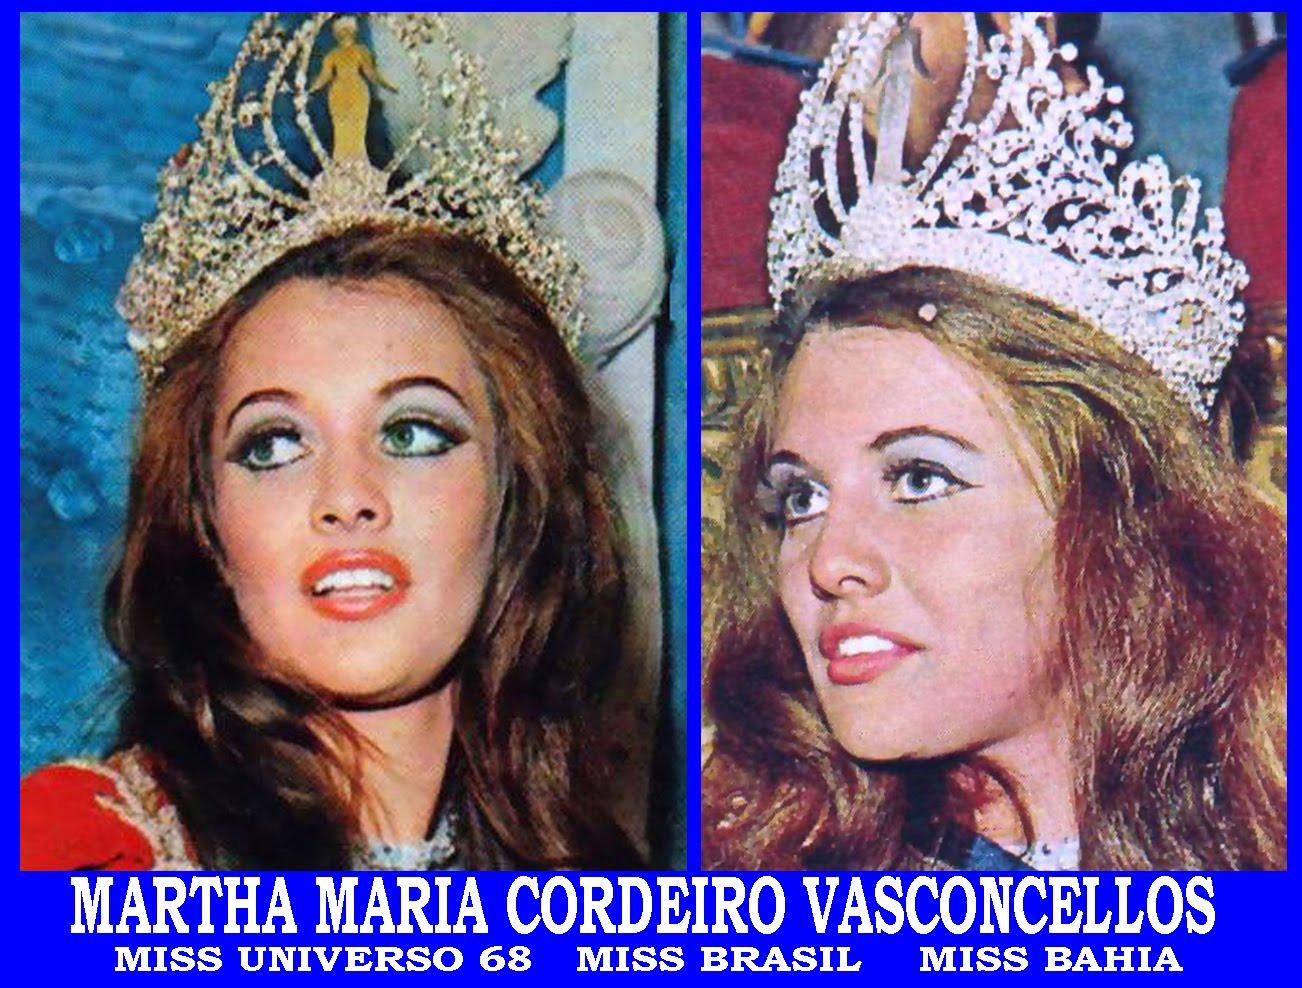 ☽ ✮ ✯ ✰ ☆ ☁ Galeria de Martha Vasconcelos, Miss Universe 1968.☽ ✮ ✯ ✰ ☆ ☁ Nossa%2B2%25C2%25AA%2BMiss%2BU%2B